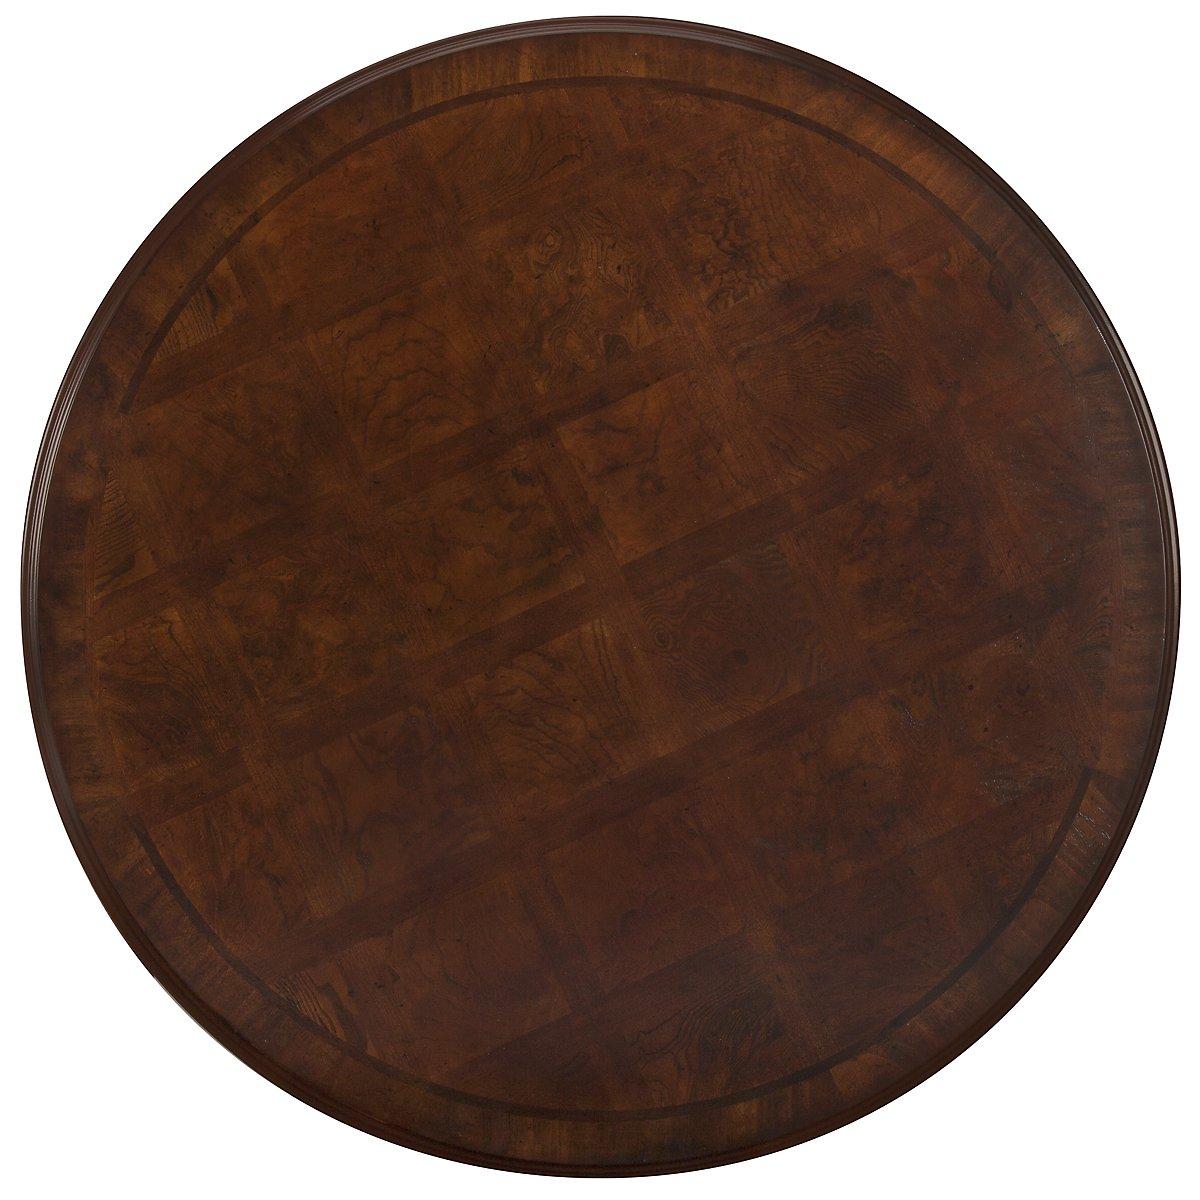 Regal Dark Tone Wood Round High/Low Table